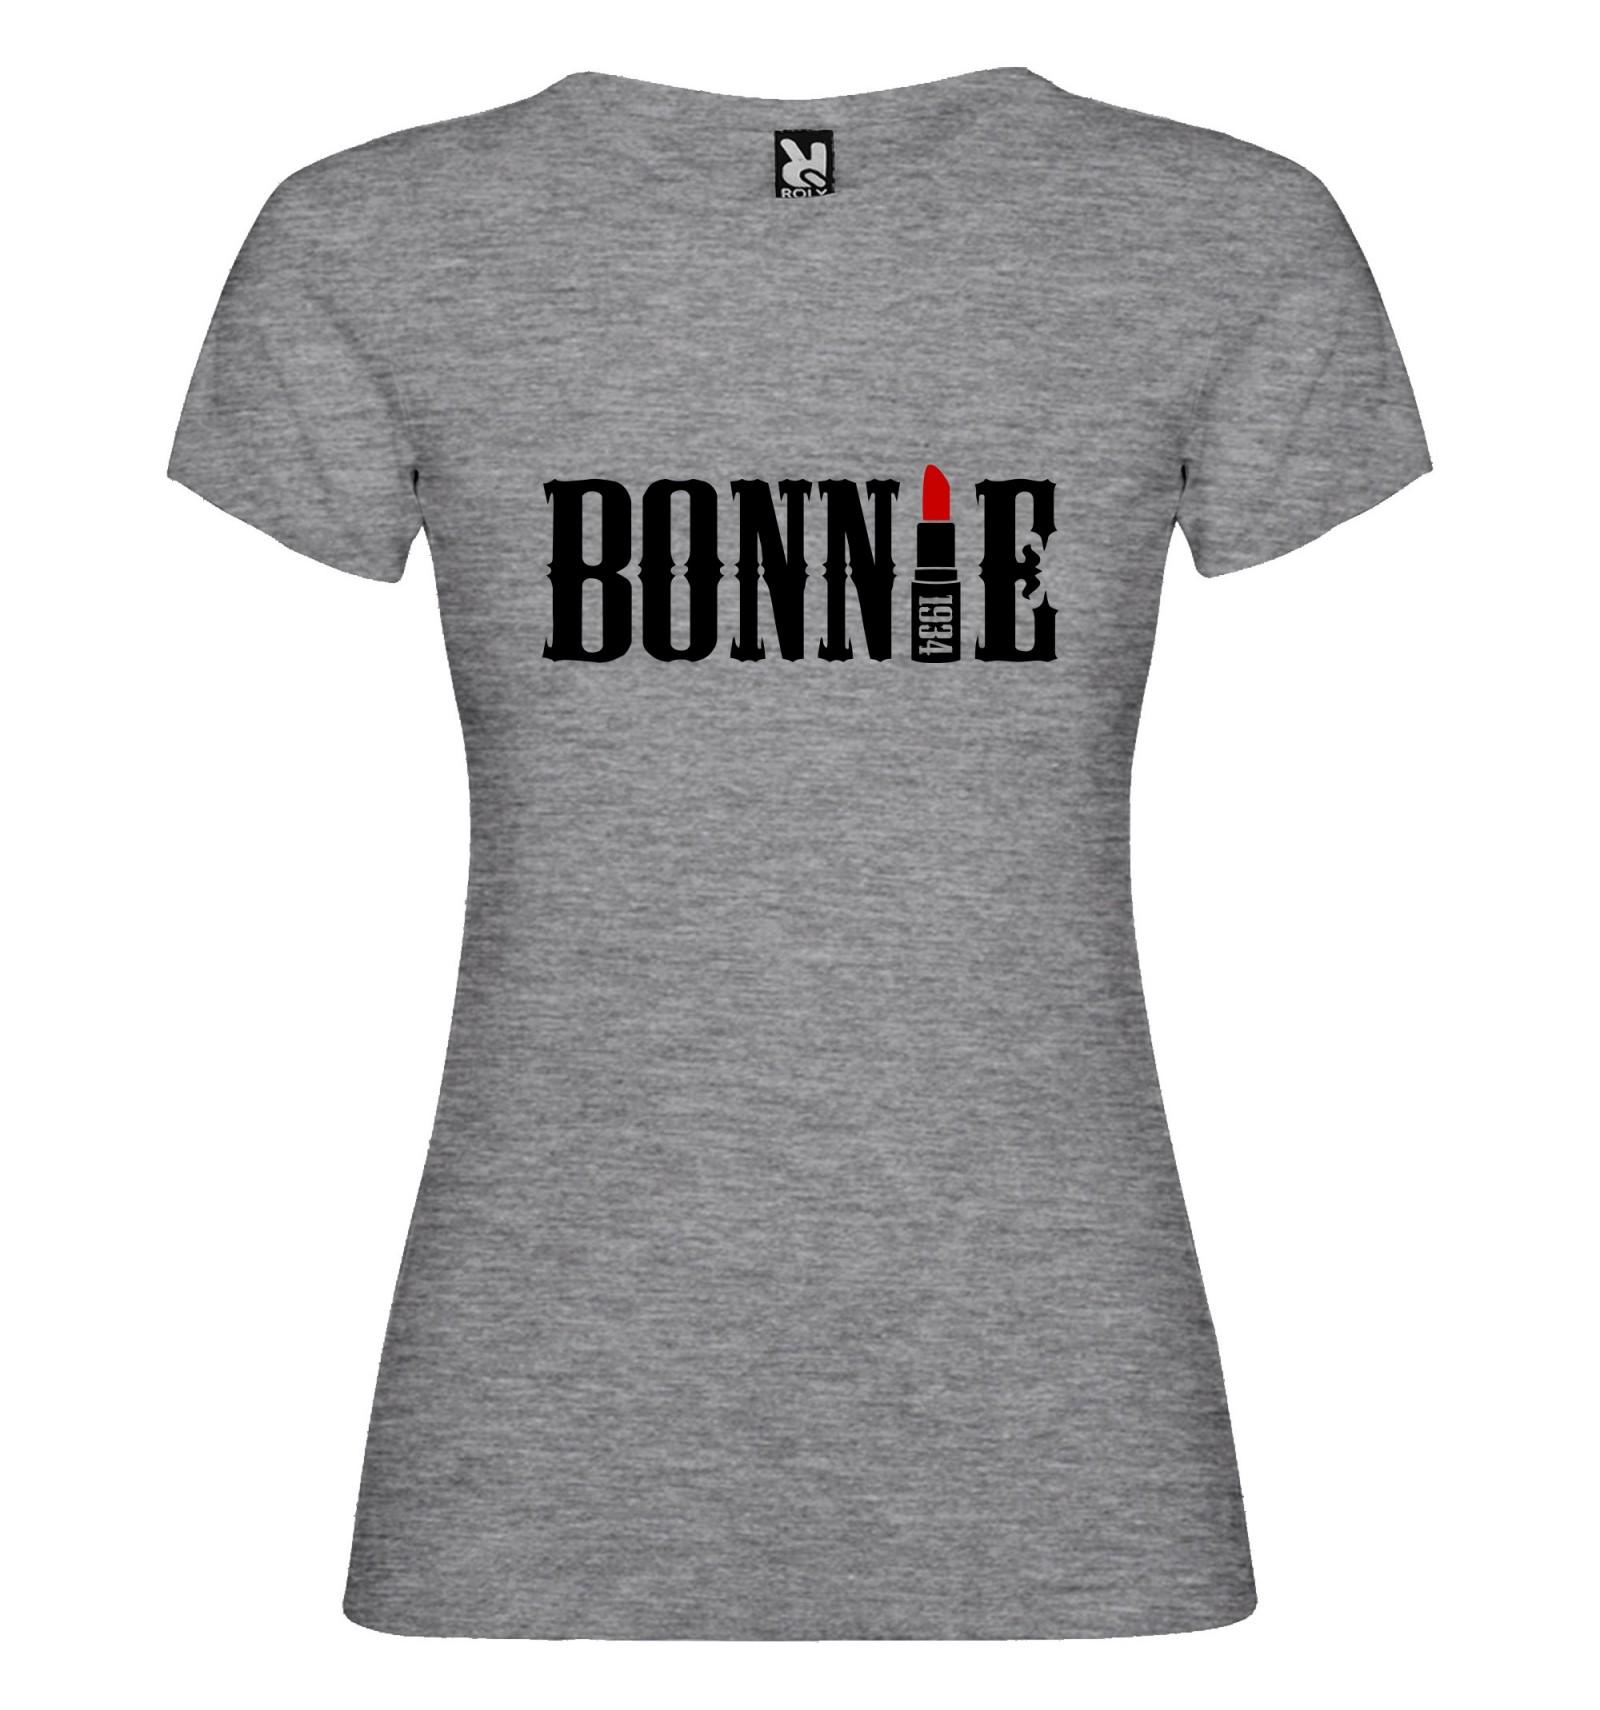 994710f097b8 Dámské tričko Bonnie 1934 - BVTRIKO